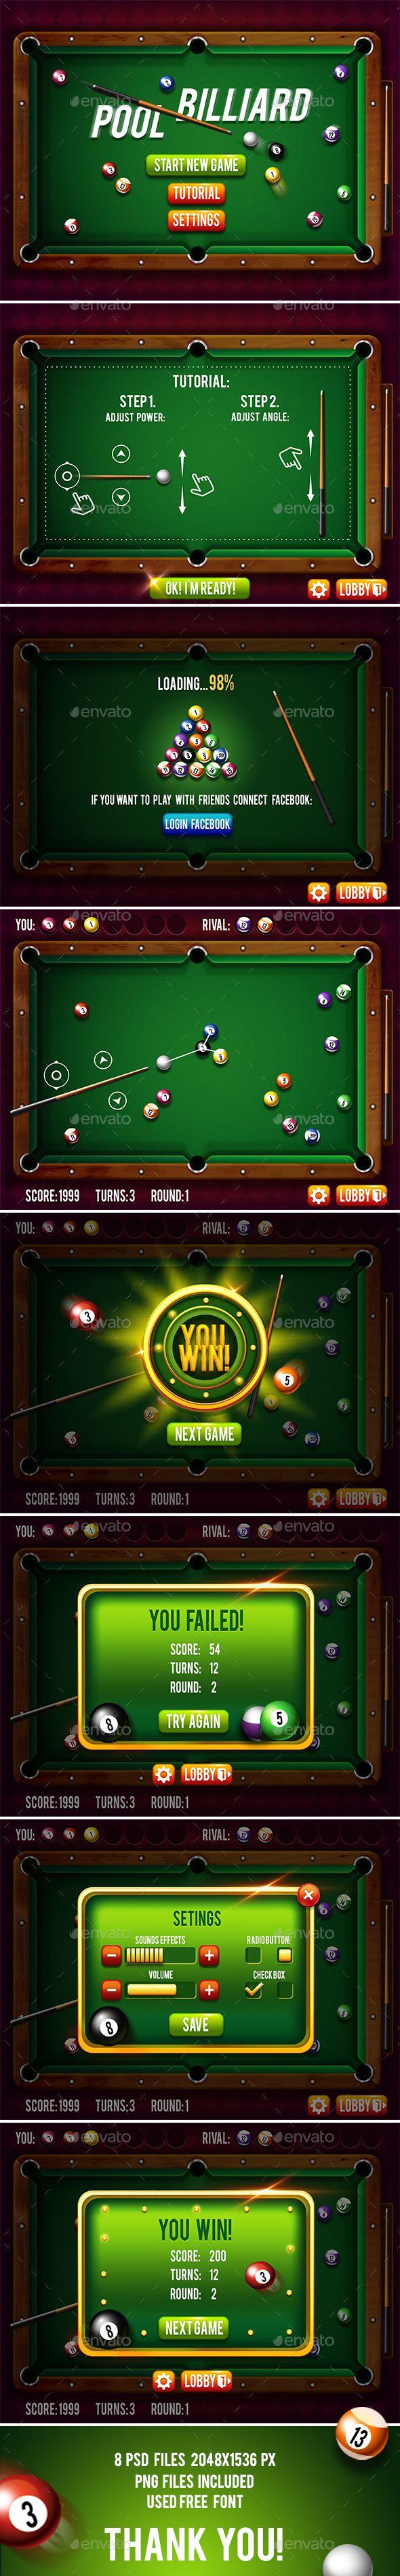 Main Game Billiard : billiard, Billiard, Billiards, Game,, Billiards,, Games